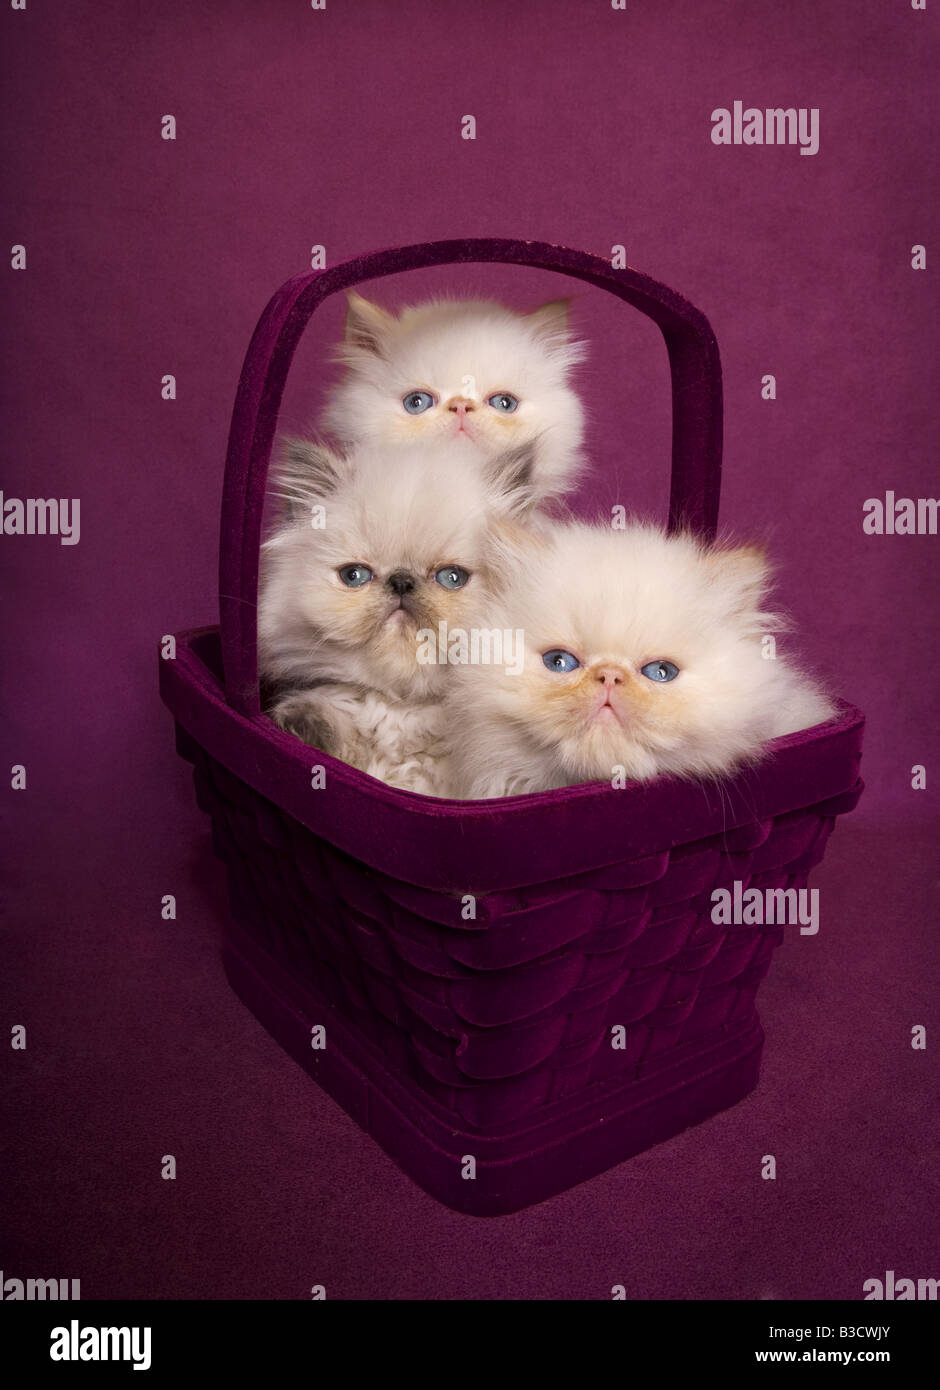 Three cute Himalayan kittens in maroon basket on maroon background - Stock Image